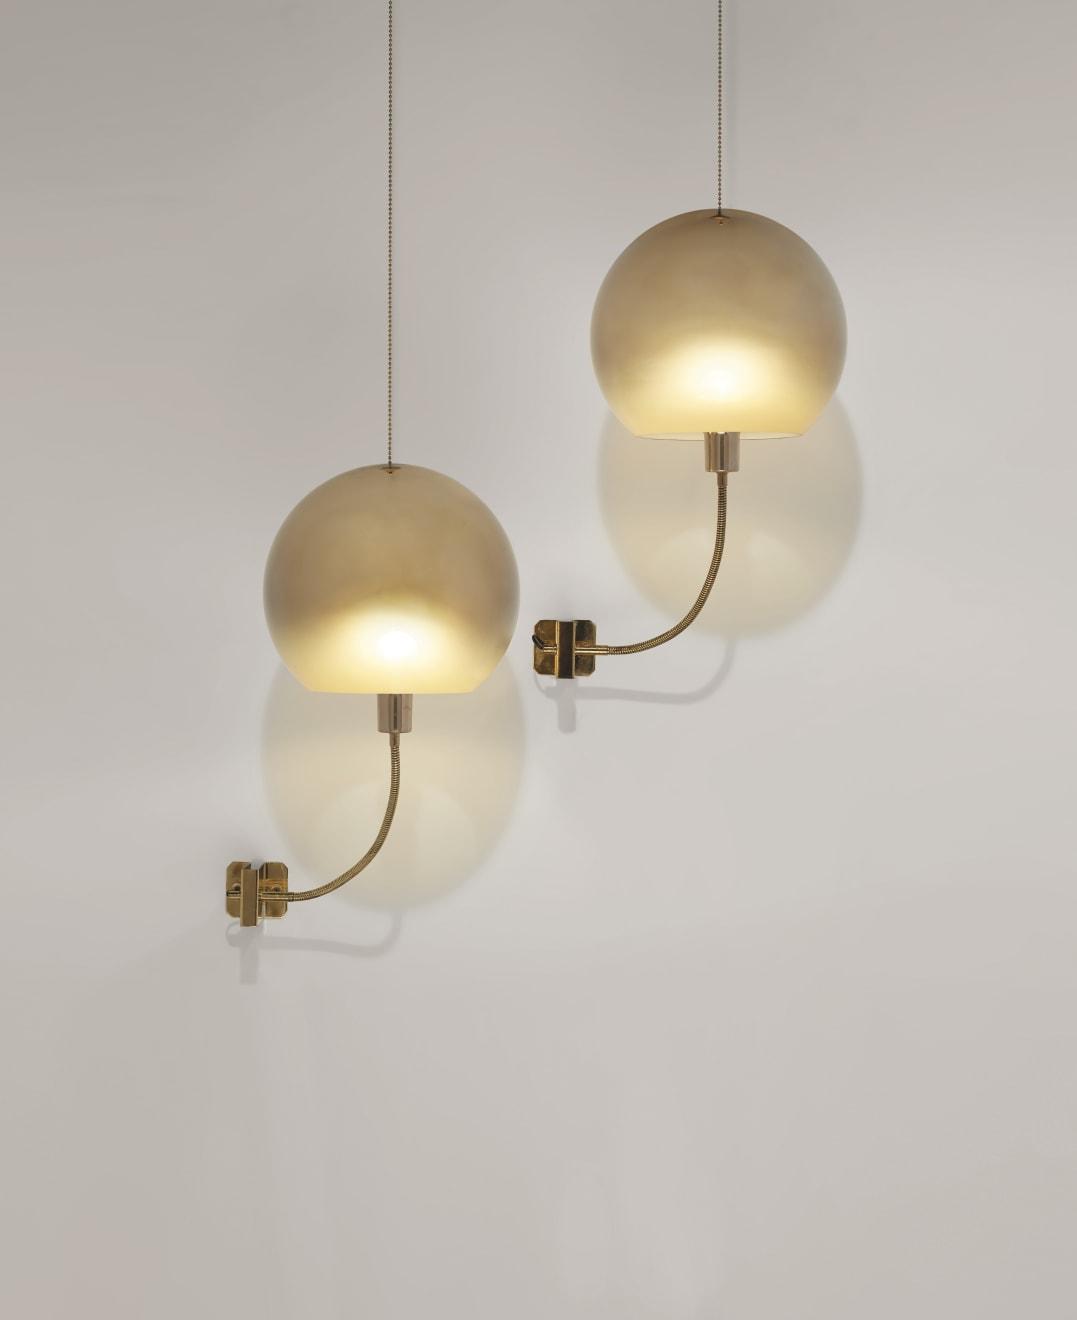 Ico Parisi, Pair of wall lights, model no. 244, c. 1960